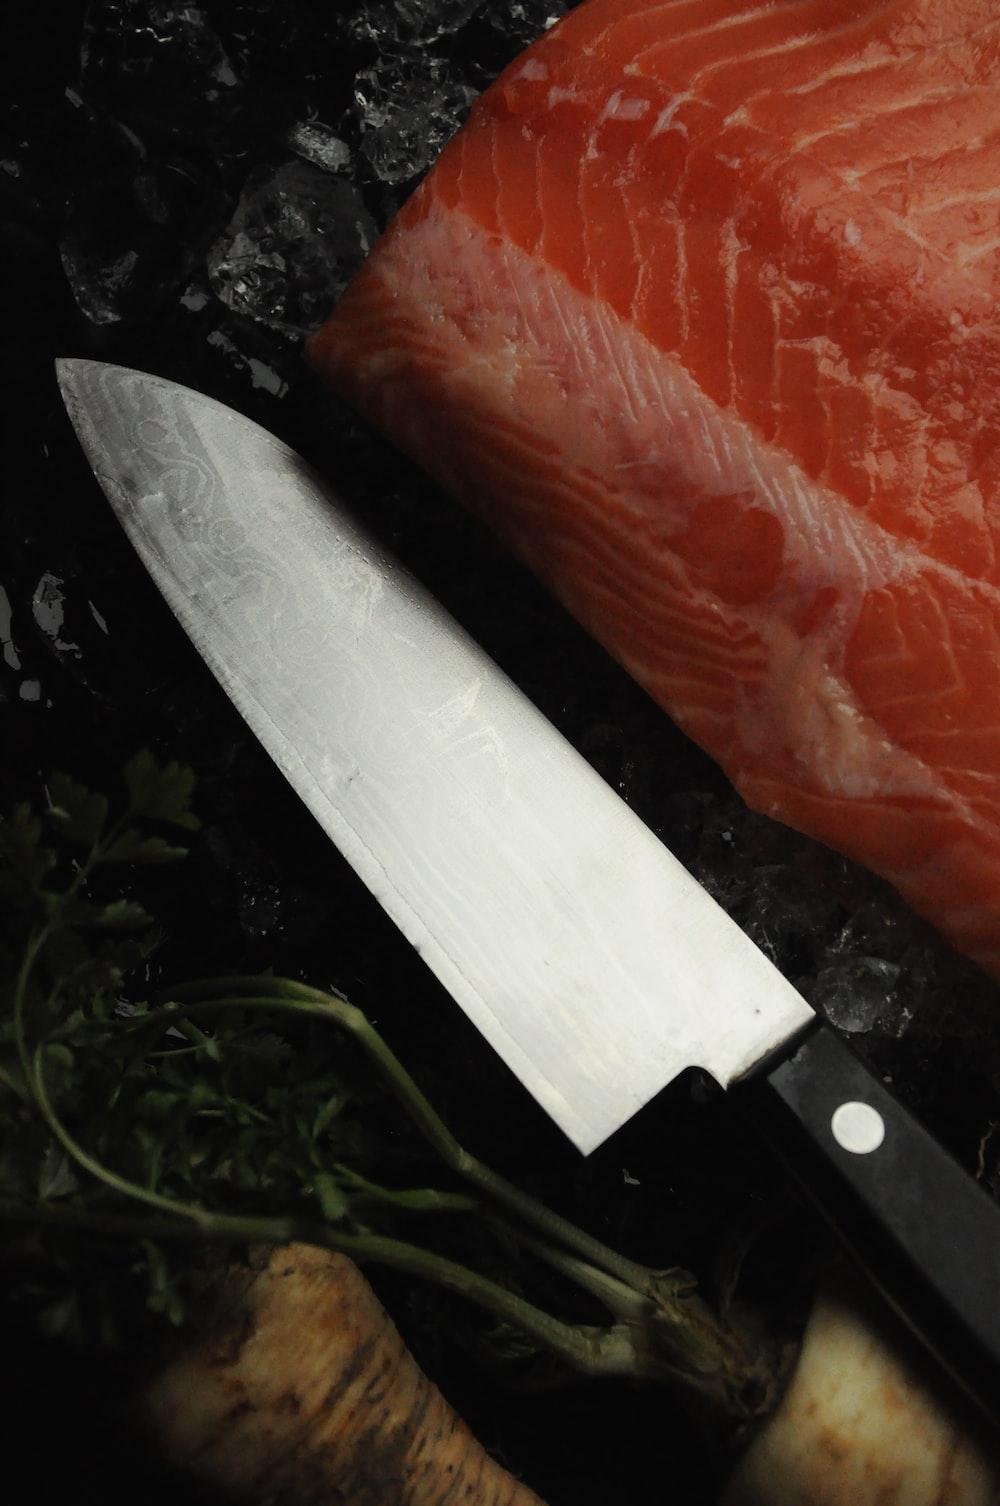 black handled knife on red textile